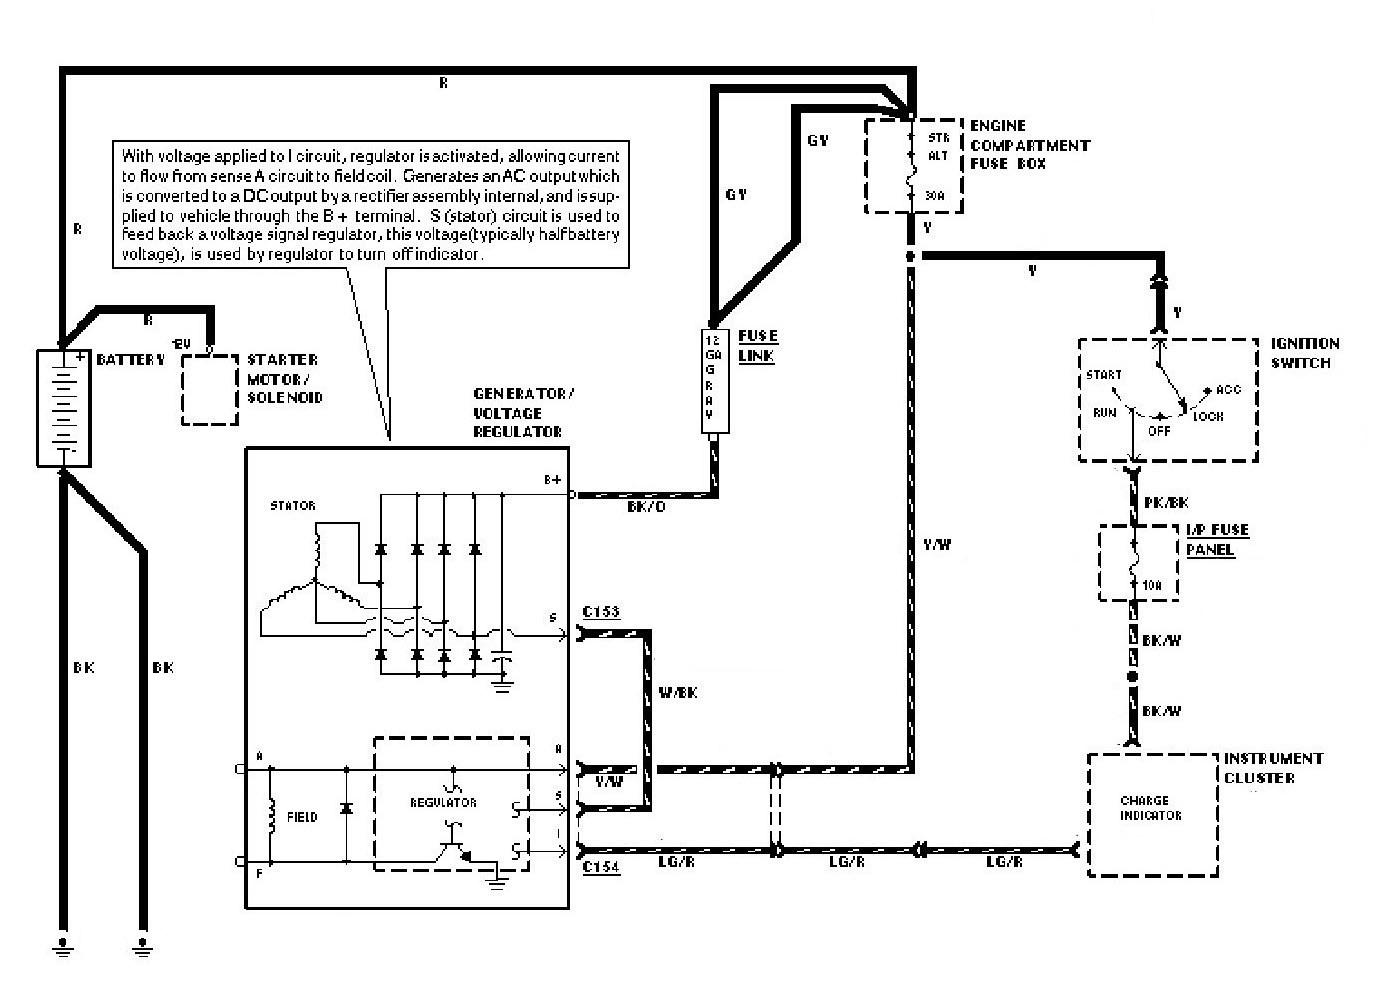 1985 Ford Alternator External Regulator Wiring Diagram - Data Wiring - Ford Alternator Wiring Diagram External Regulator